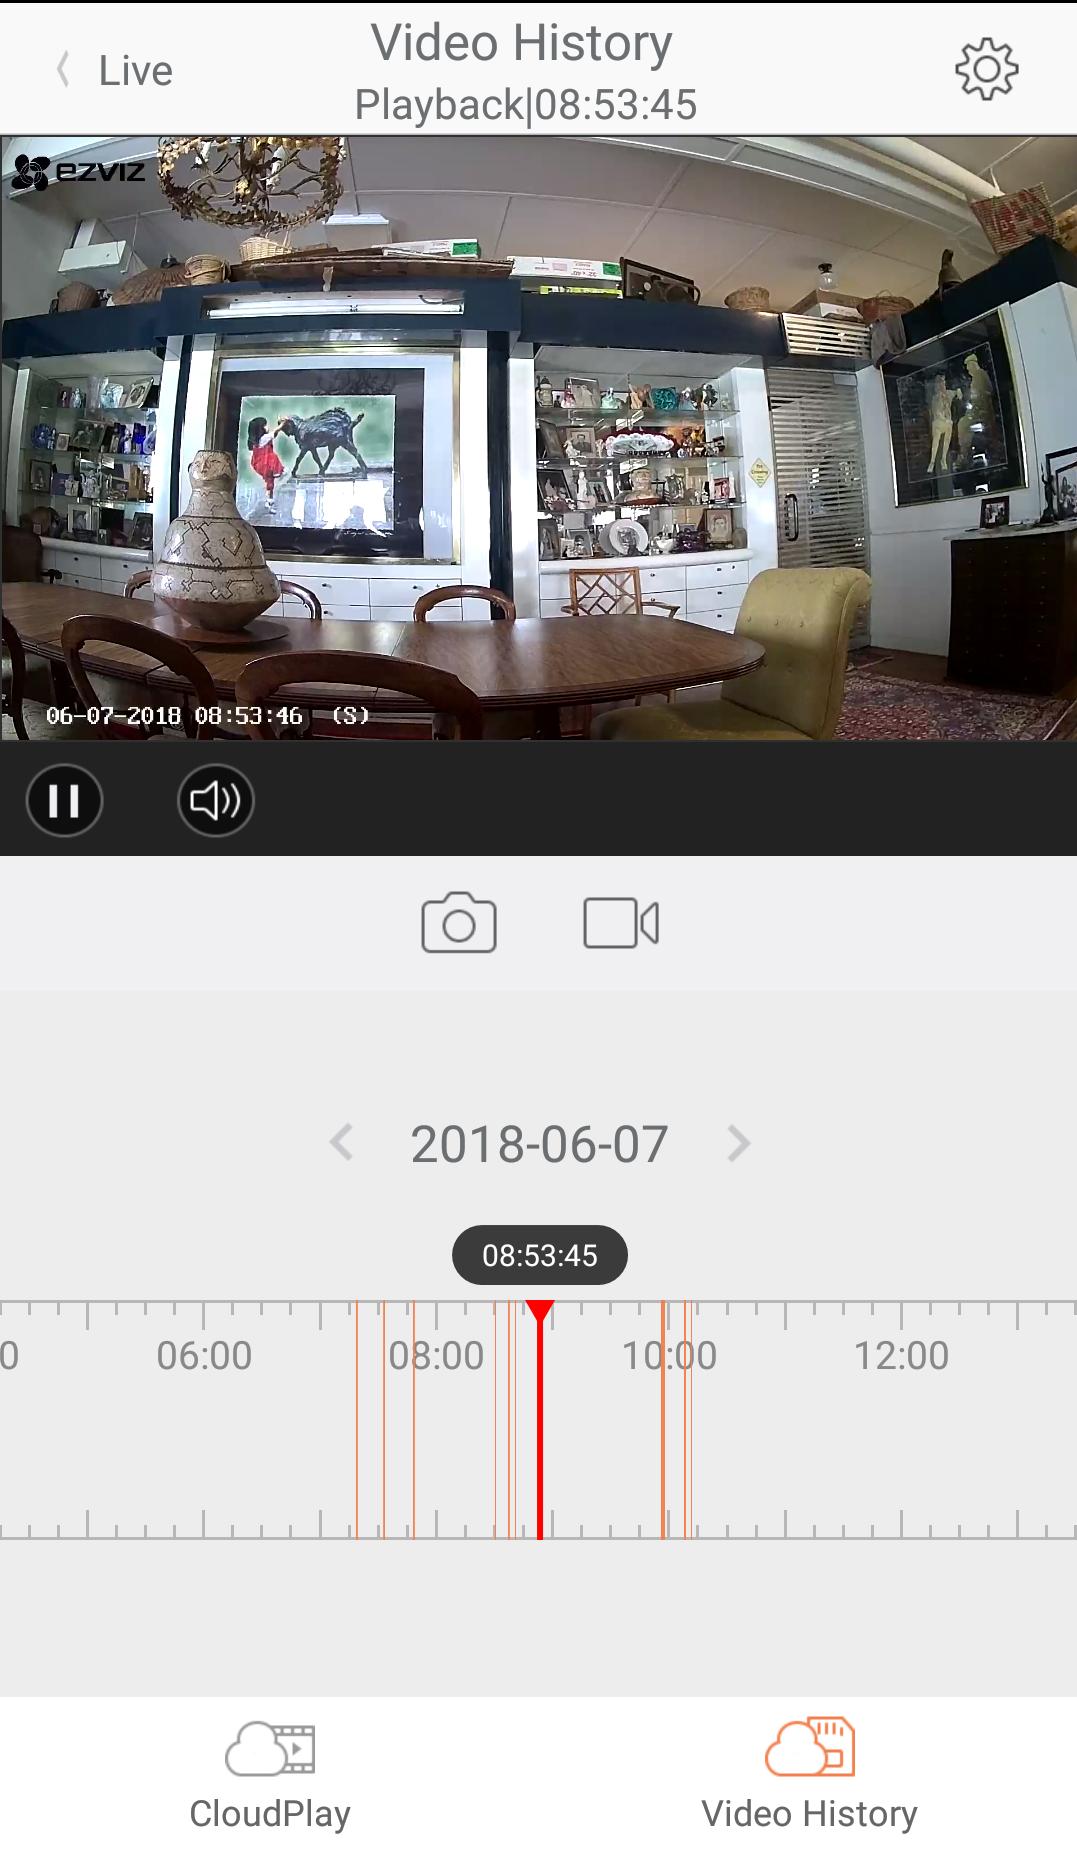 Ezviz Mini O 1080p - Full Review and Benchmarks | Tom's Guide